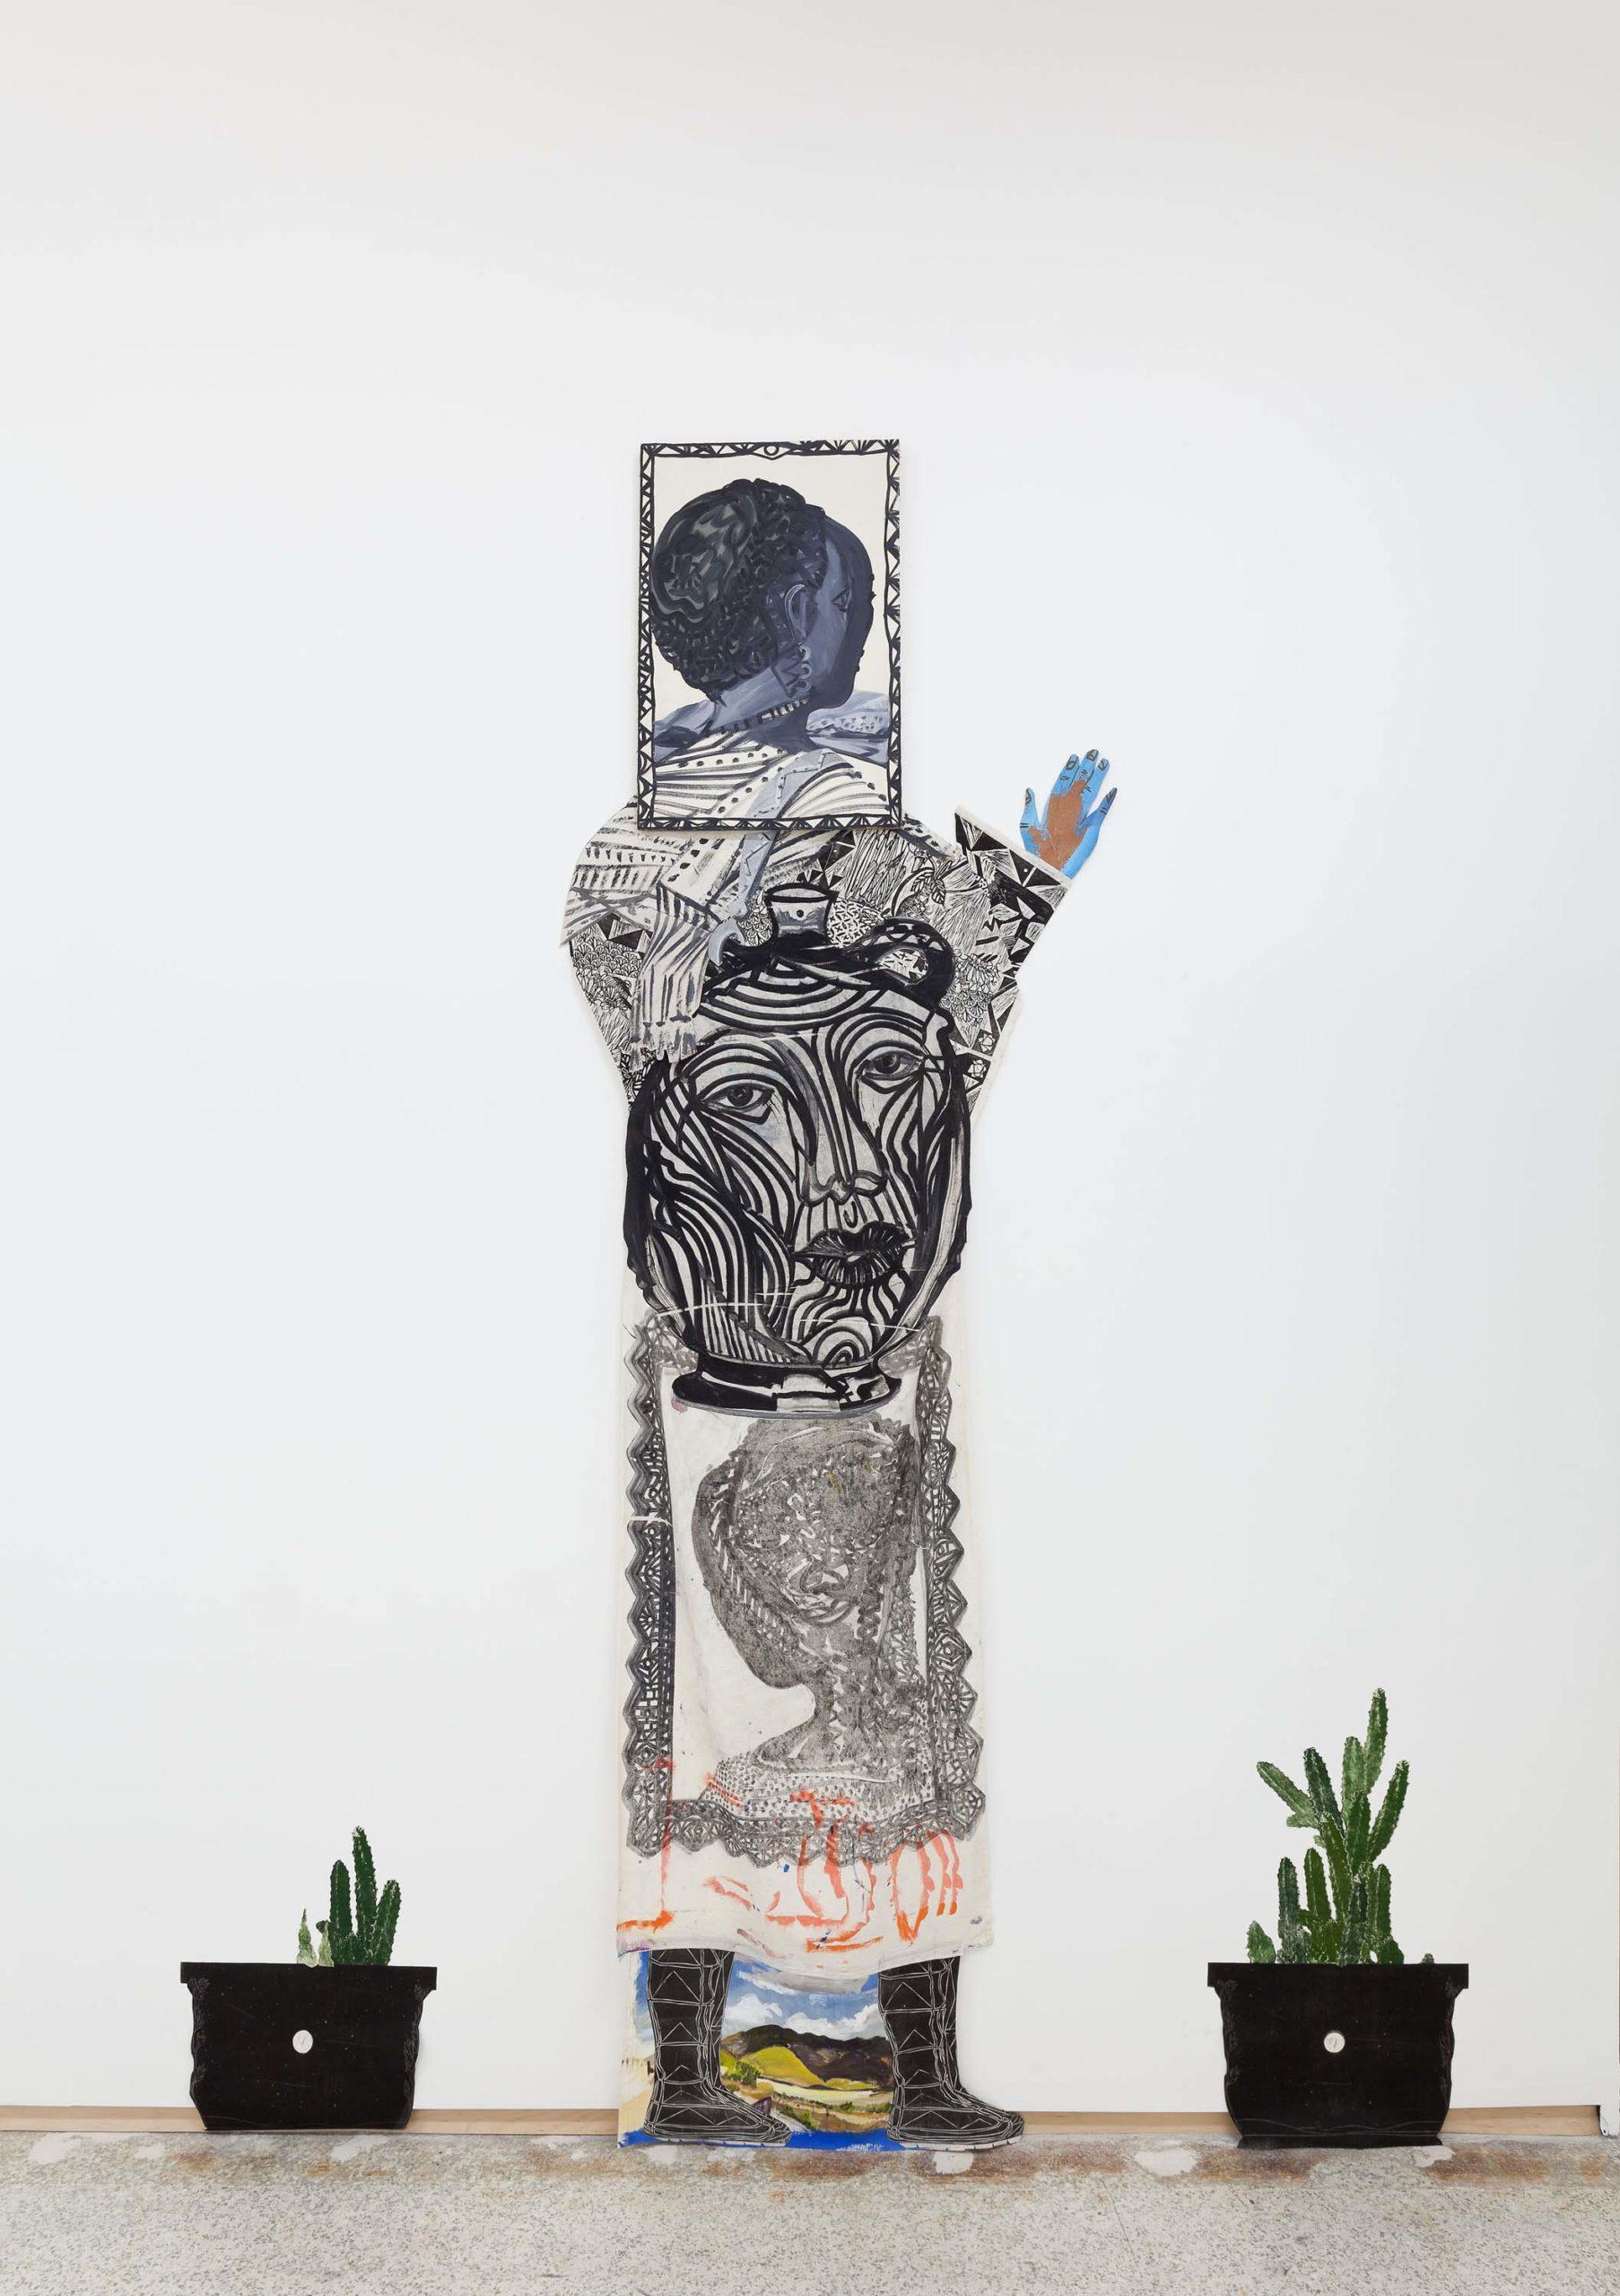 Paula Wilson, Sightseer, 2017